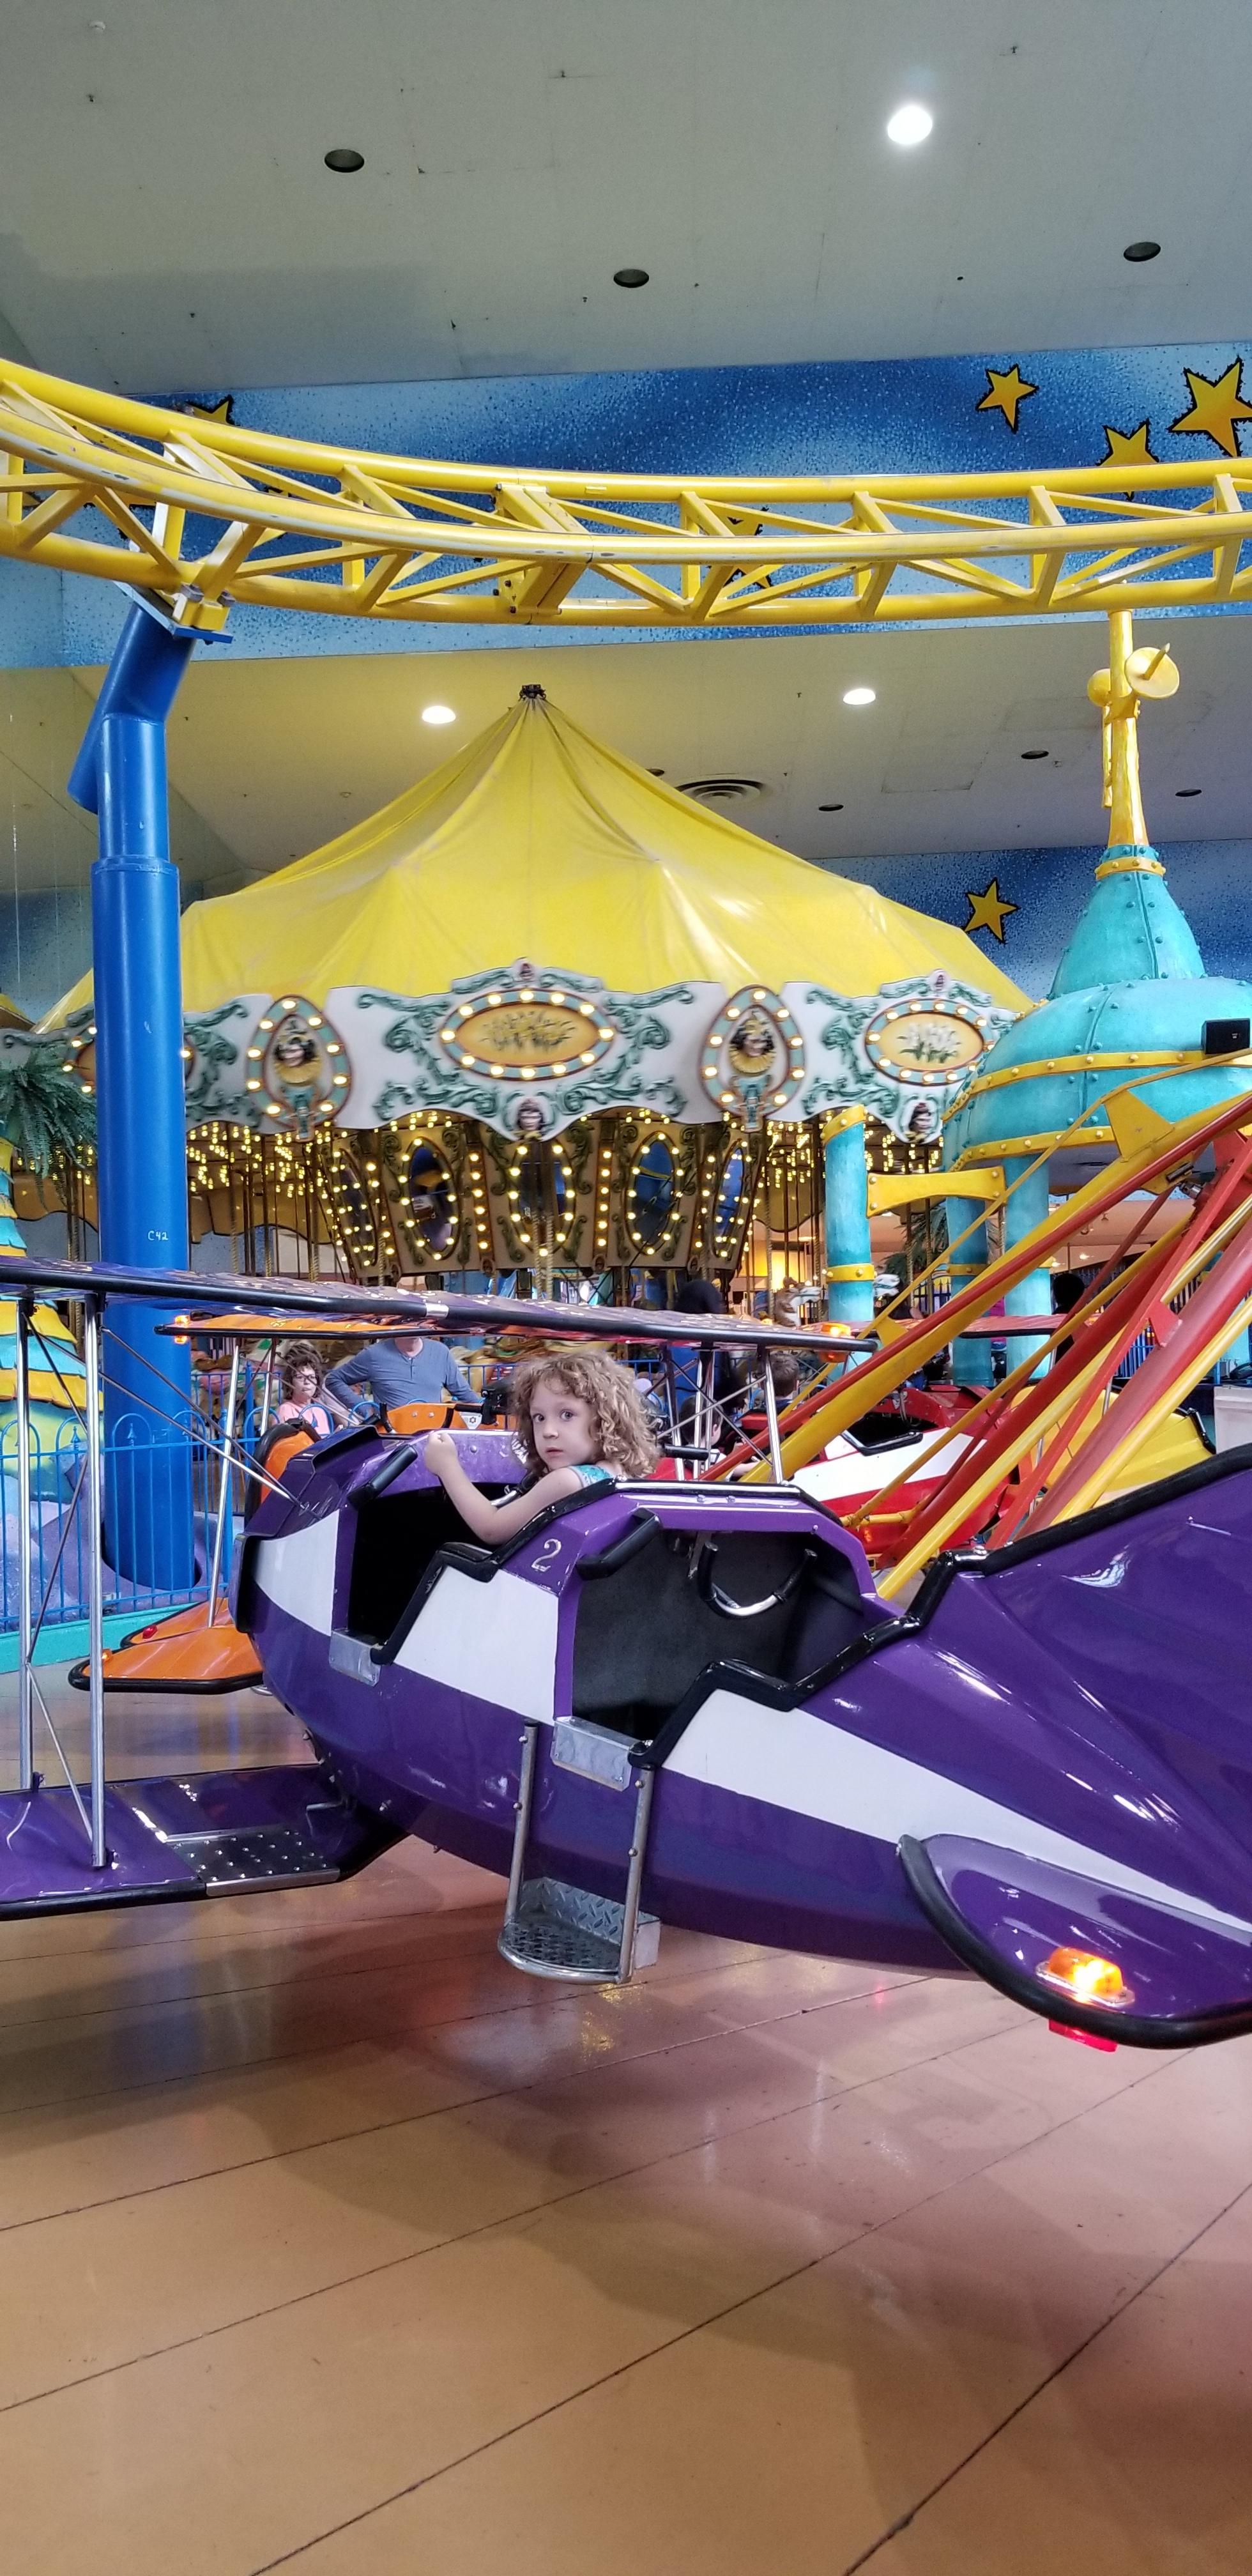 west edmonton mall galaxyland amusement park tips.jpg